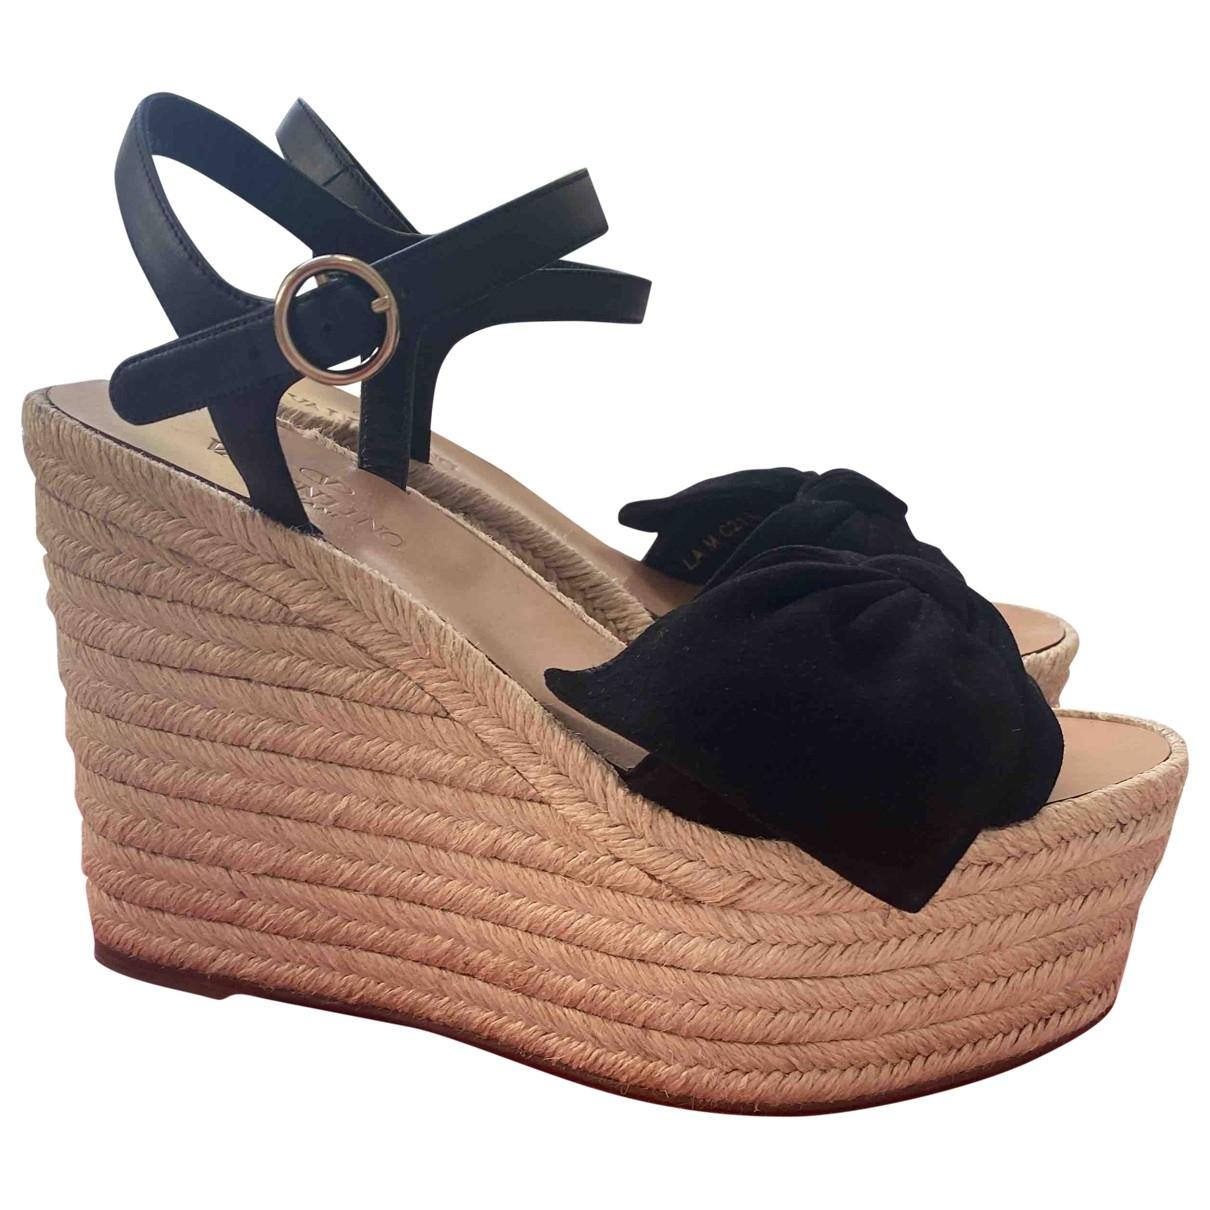 Valentino Garavani \N Black Suede Sandals for Women 37 EU